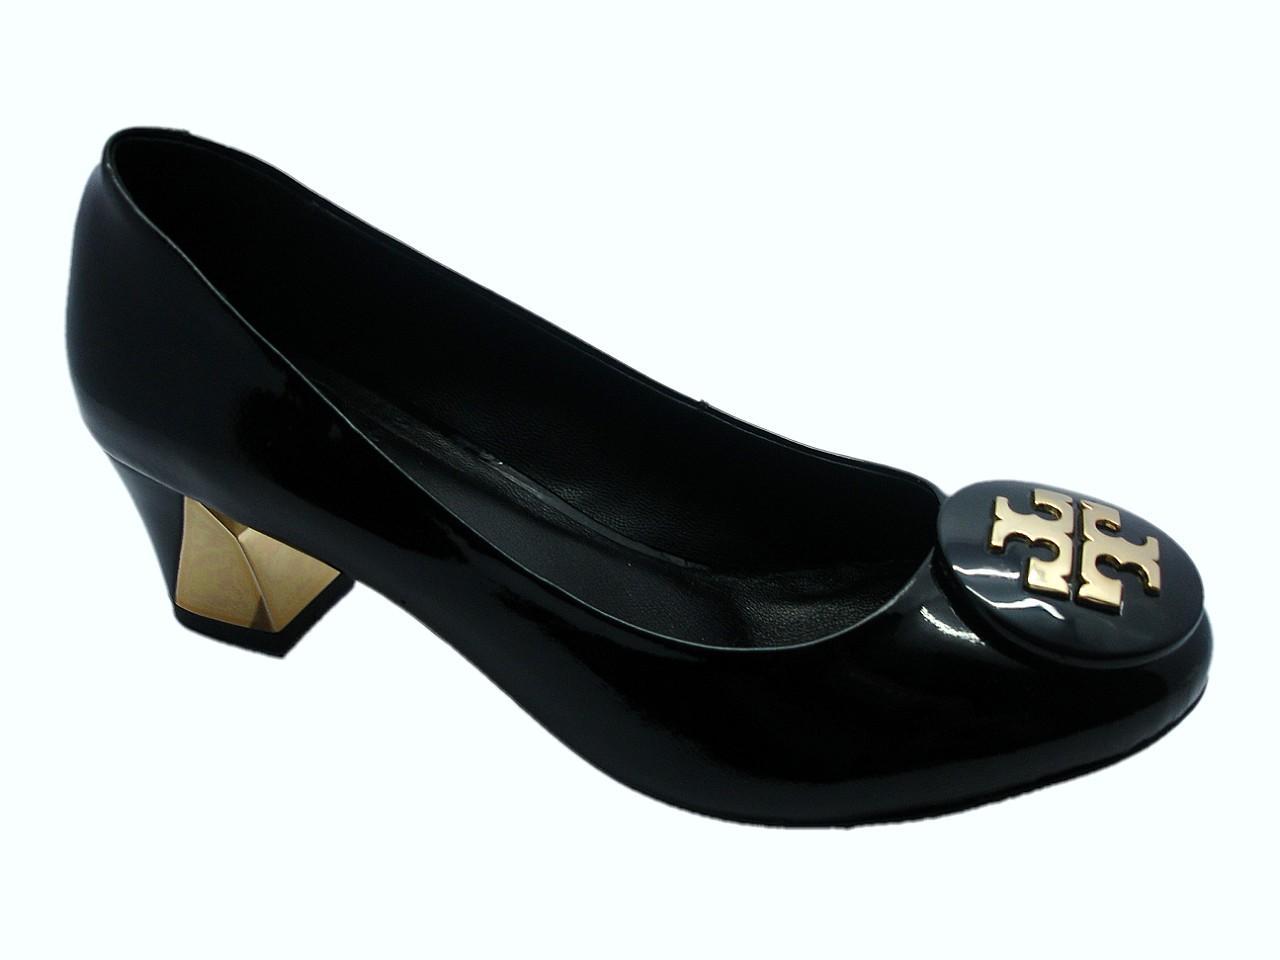 Tory Burch Heel Shoes Black